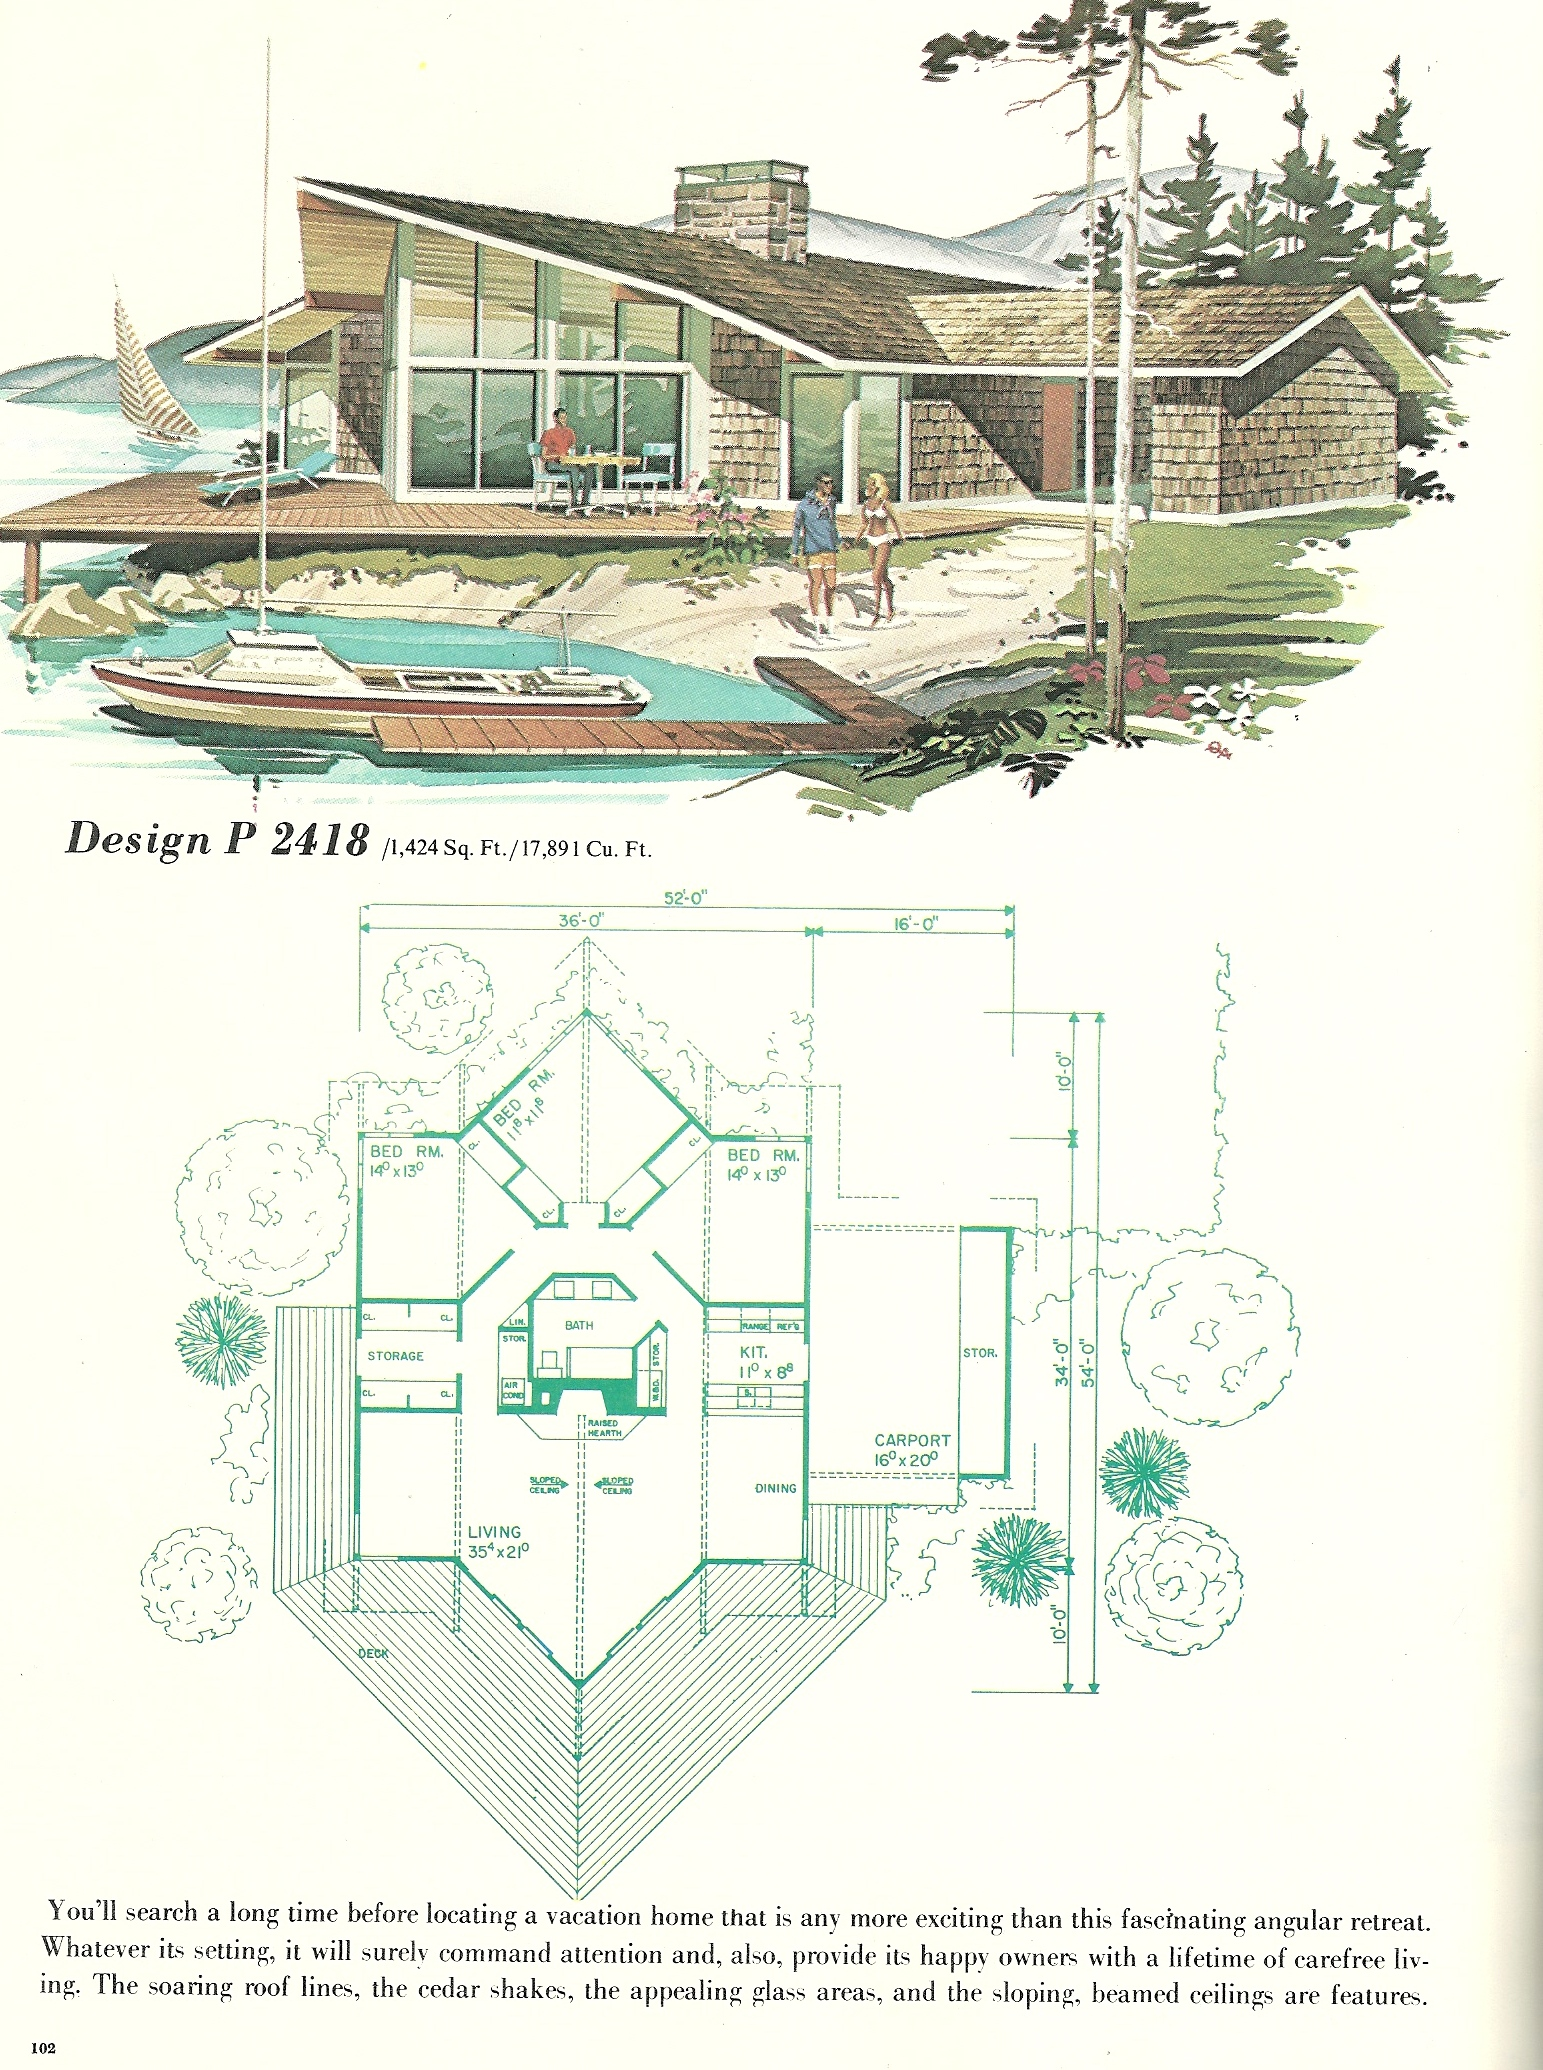 Vintage Vacation Home Plans 2418 Antique Alter Ego